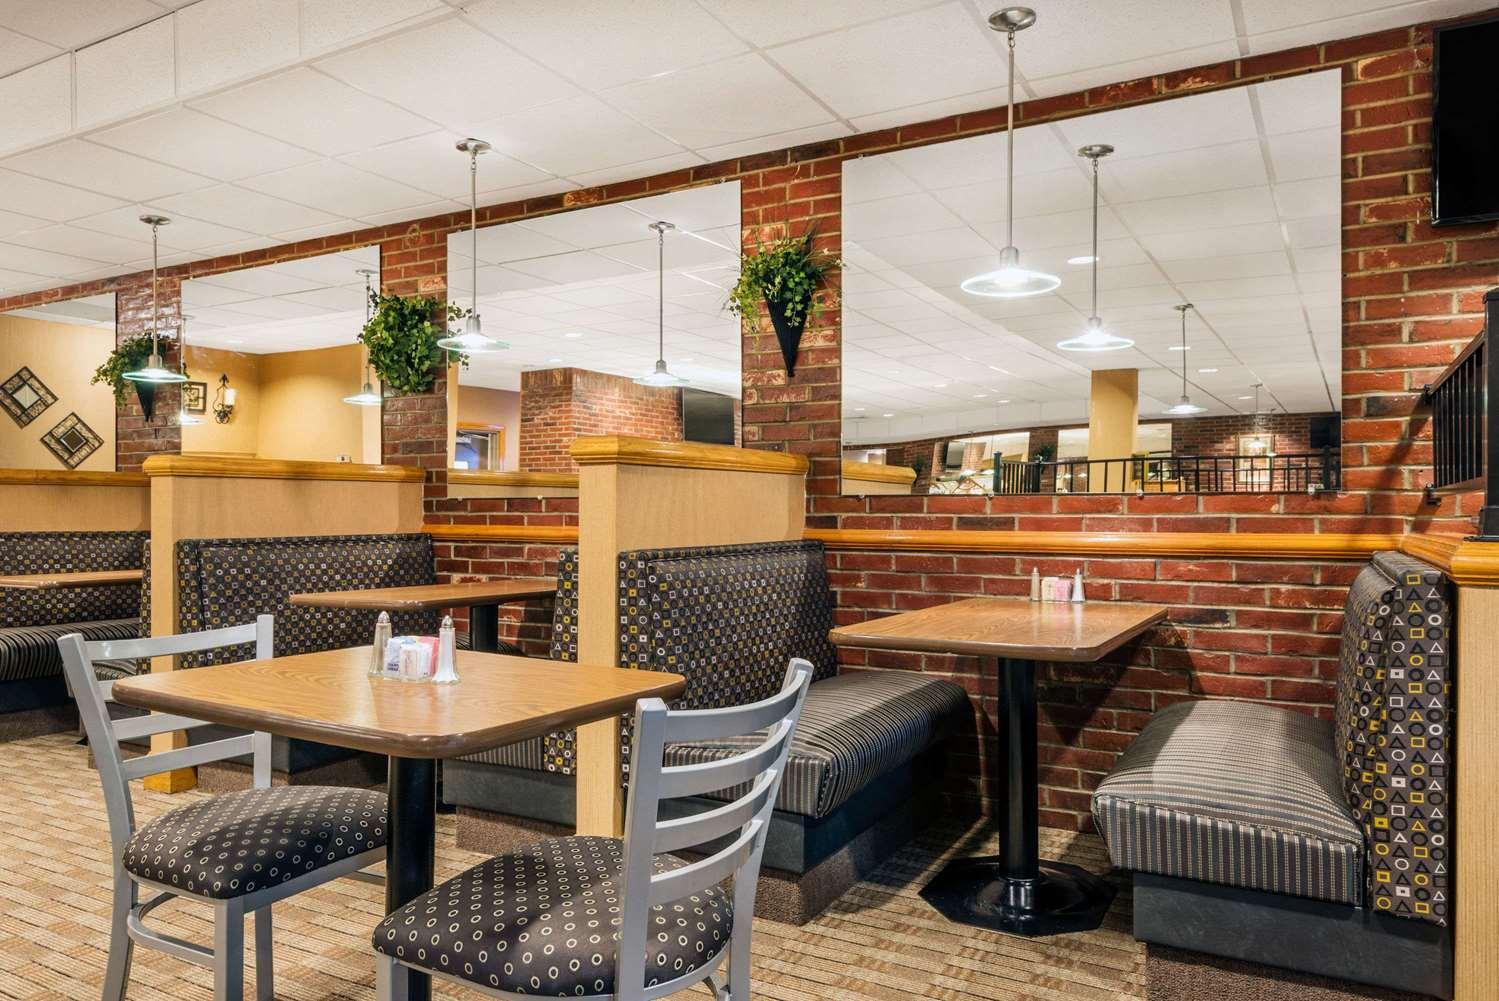 Ramada Inn & Conference Center Paintsville, KY - See Discounts